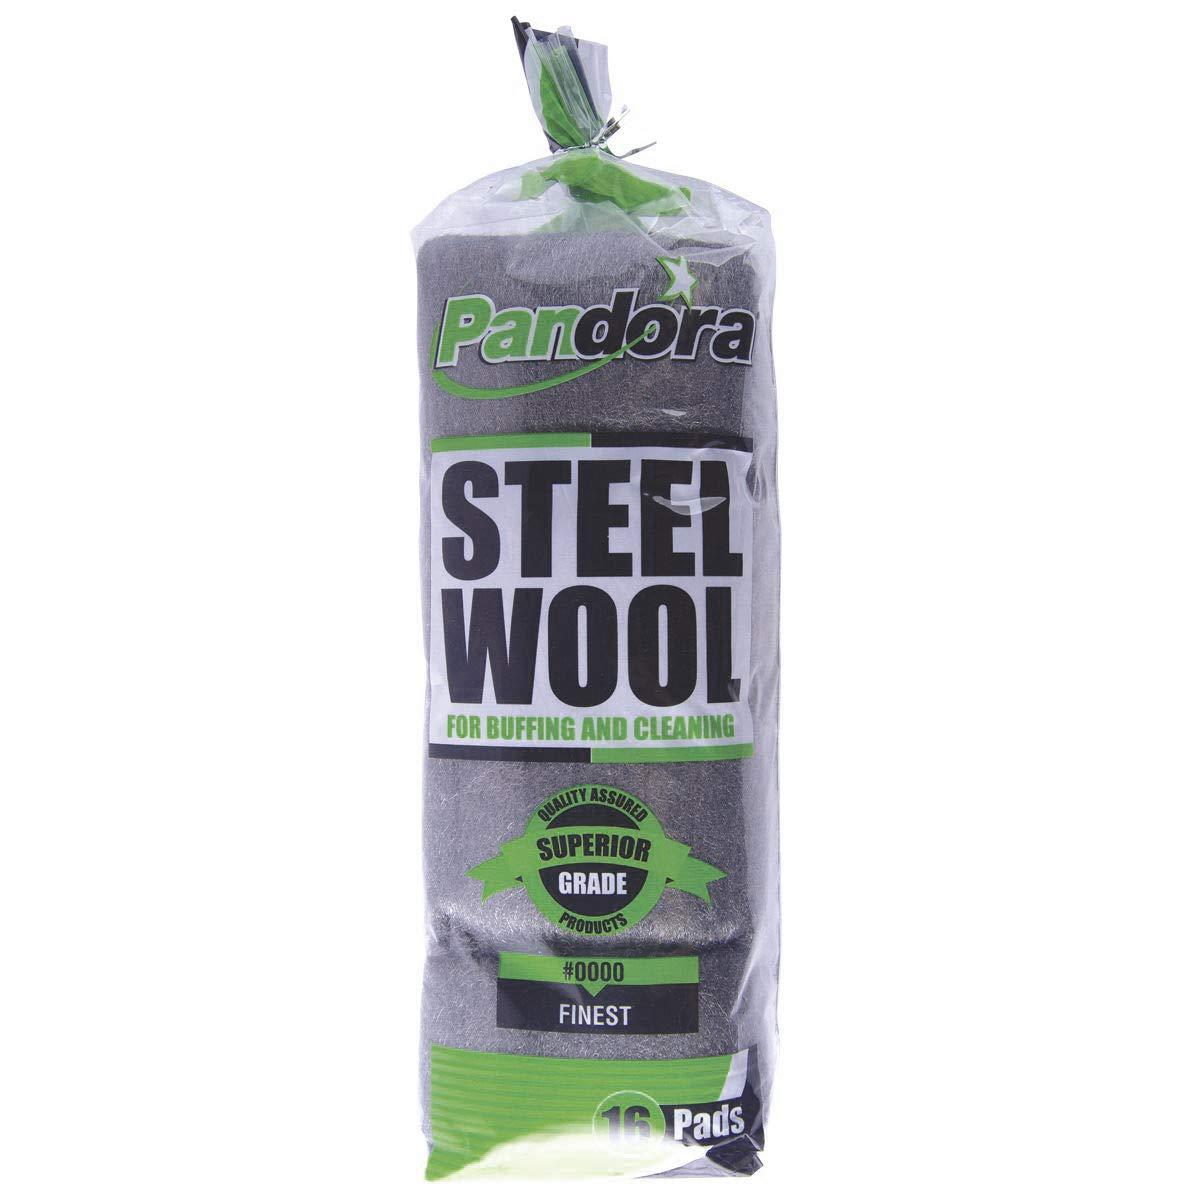 Pandora Sales Steel Wool 16 0000 Finest Pads Spasm price